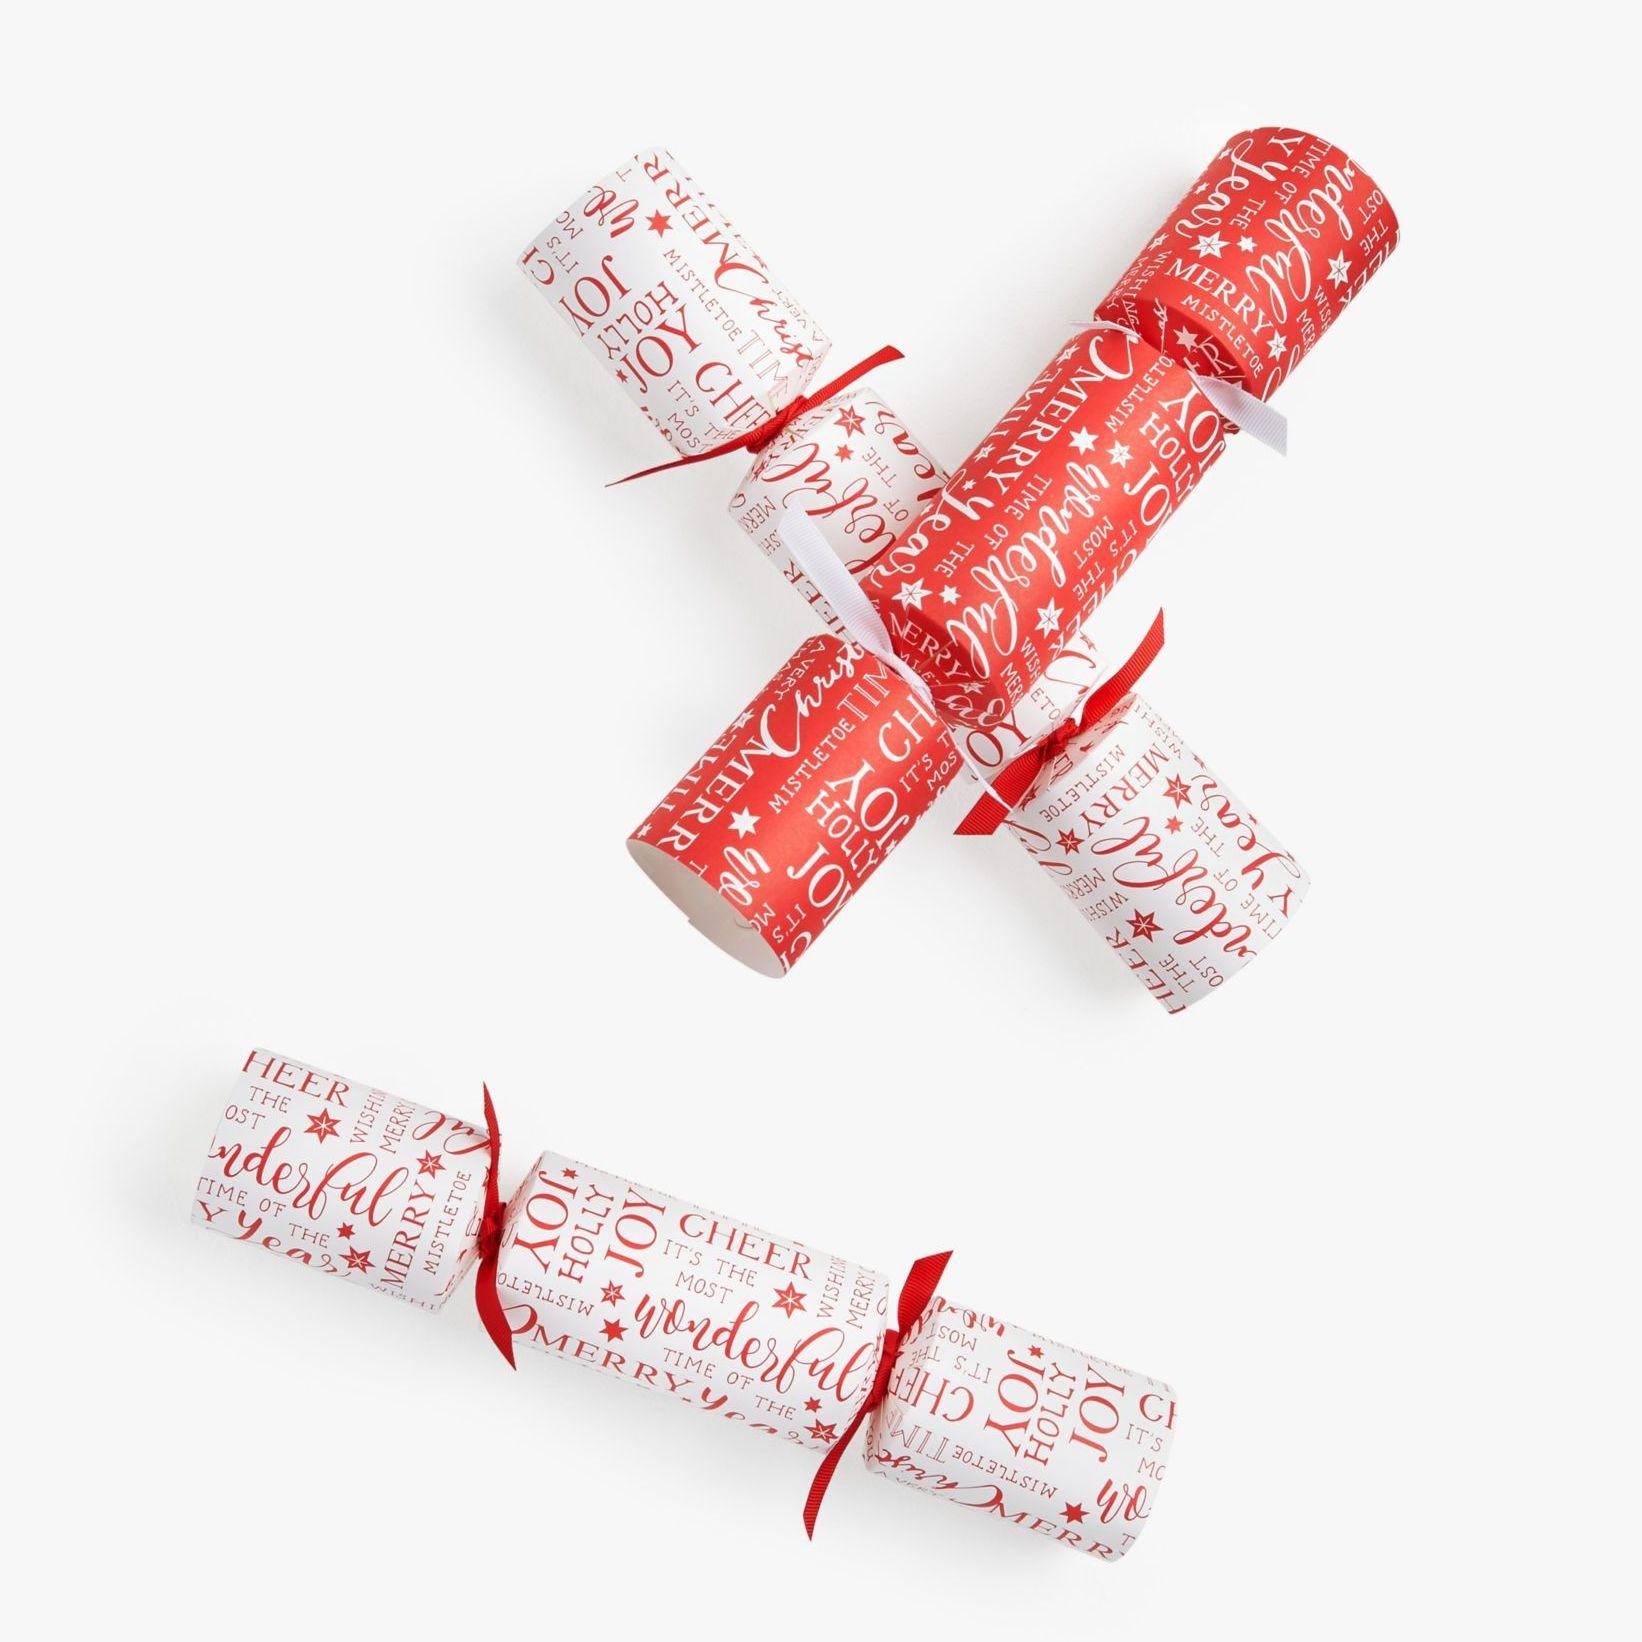 John Lewis, Waitrose Ban Plastic Toys In Christmas Crackers